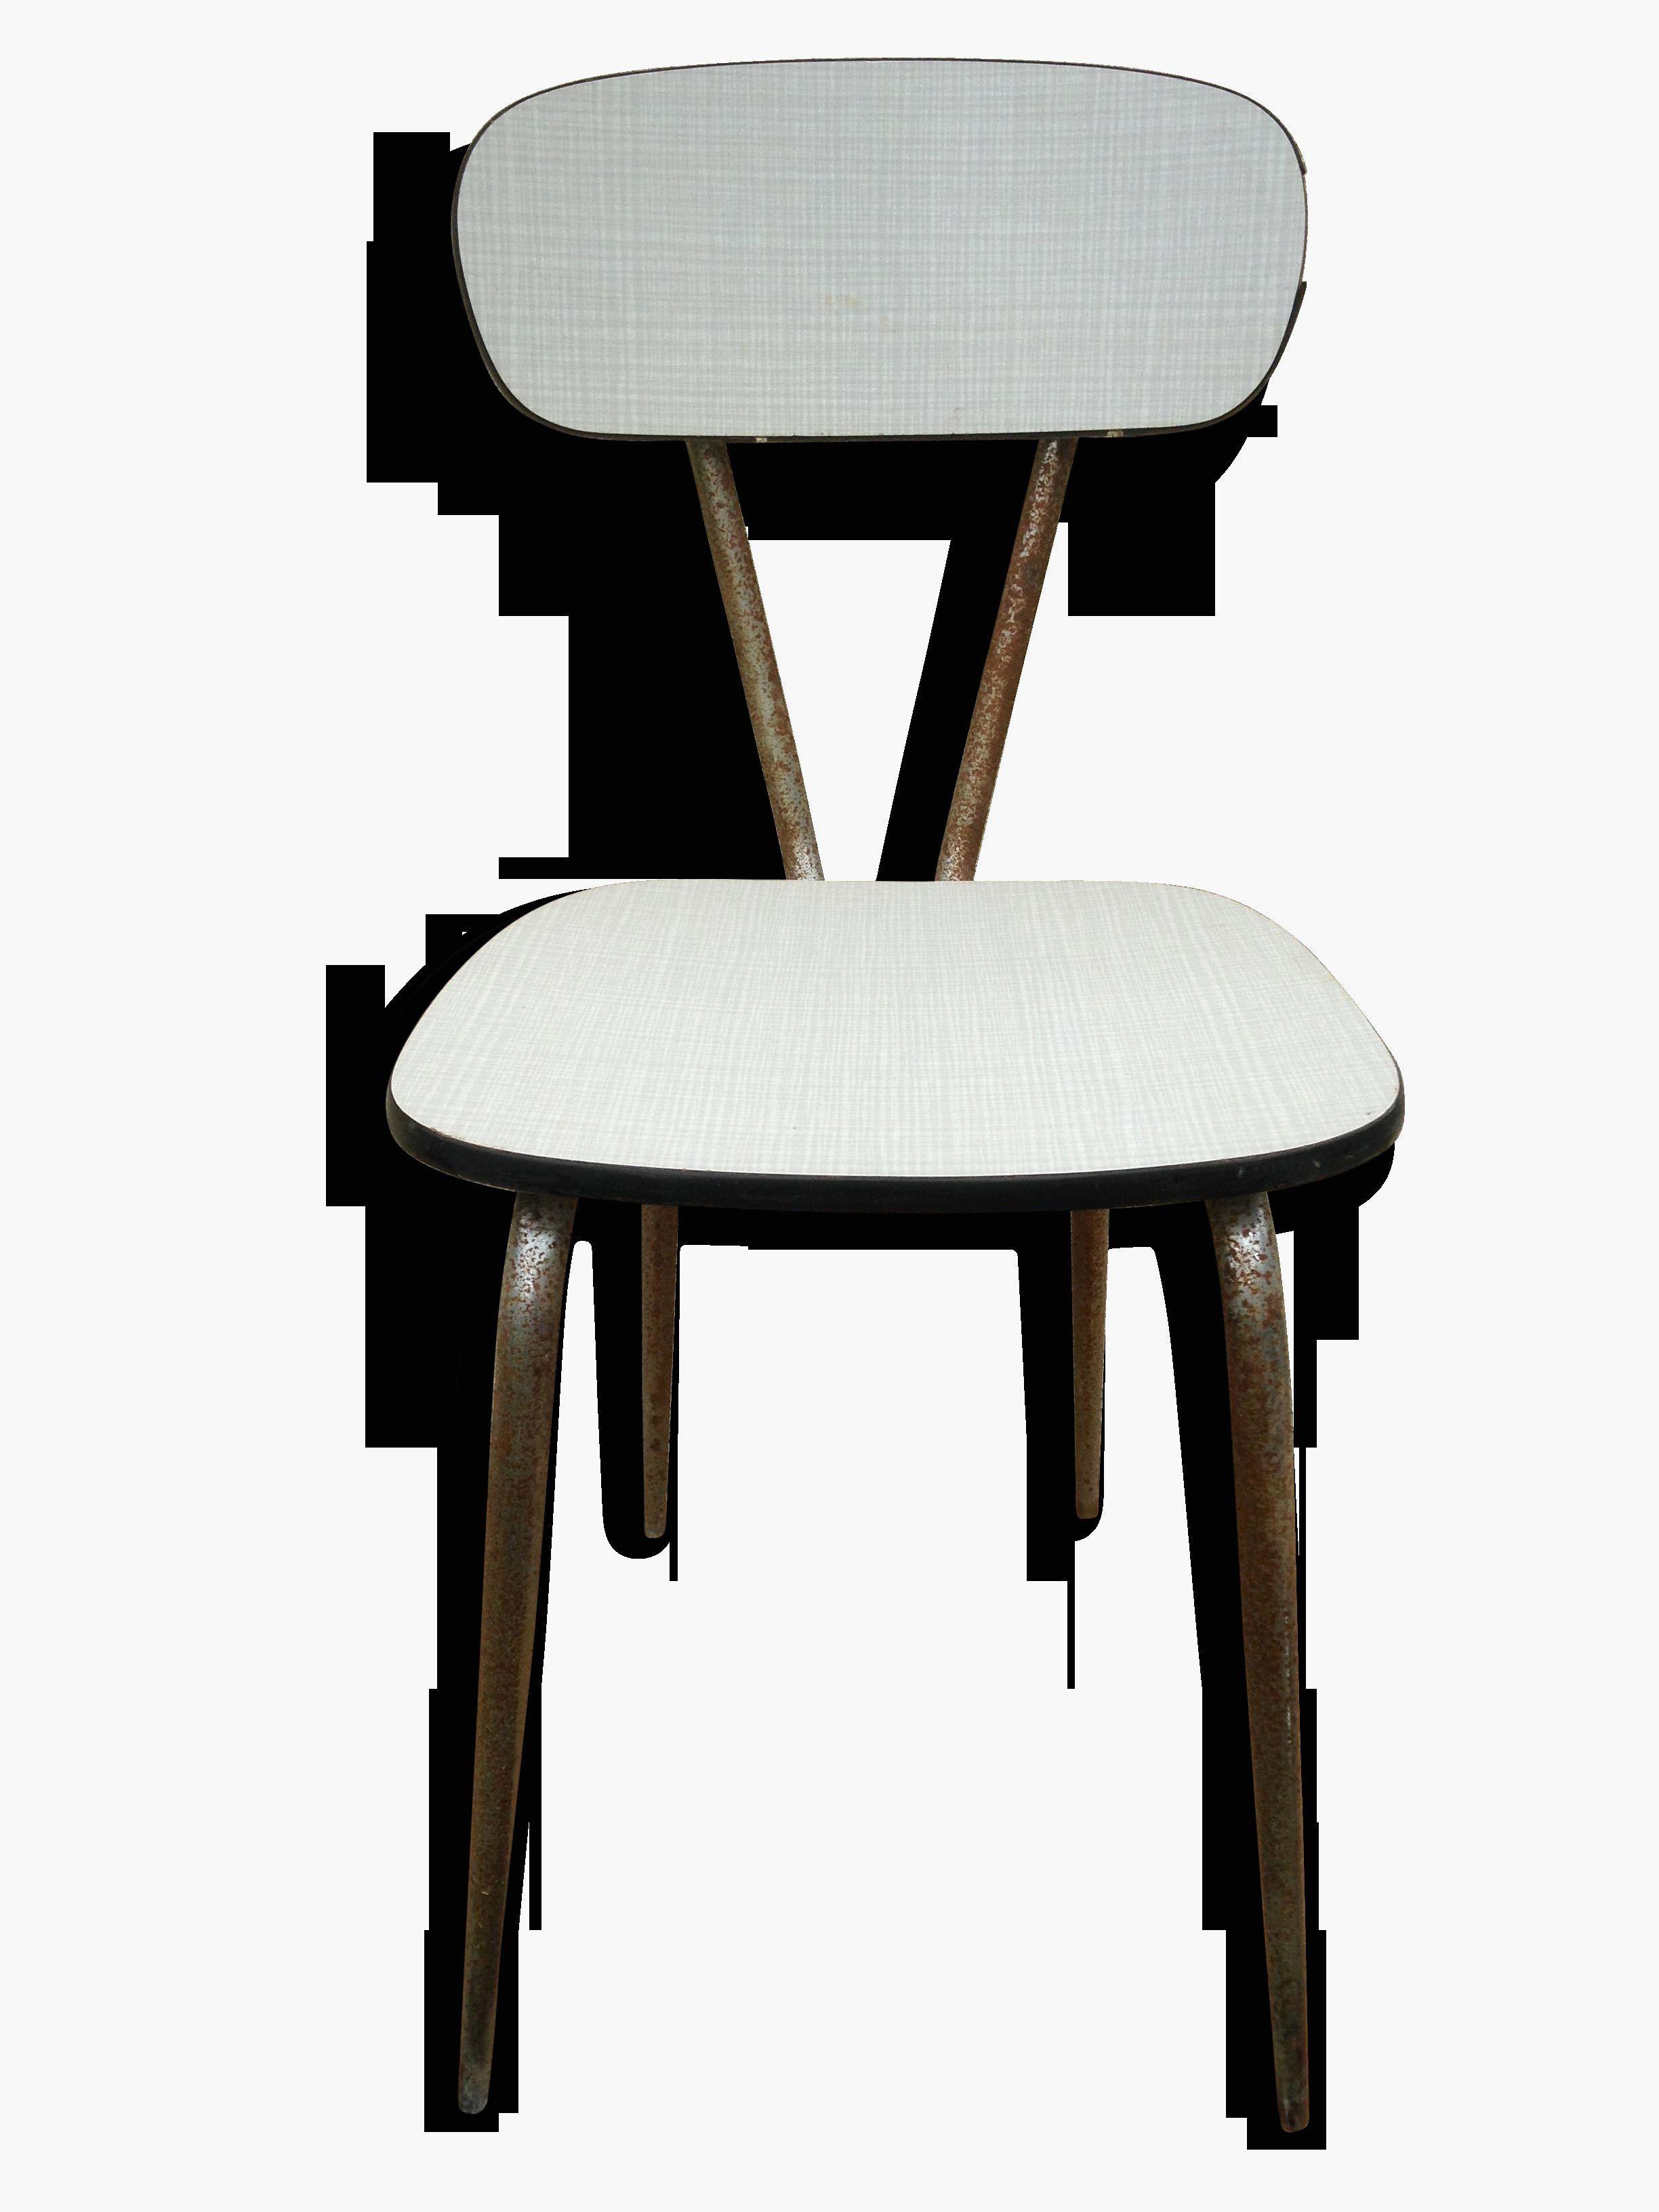 Fresh Bureau Roche Bobois Occasion Saarinen Dining Table Danish Style Sofas Side Chairs